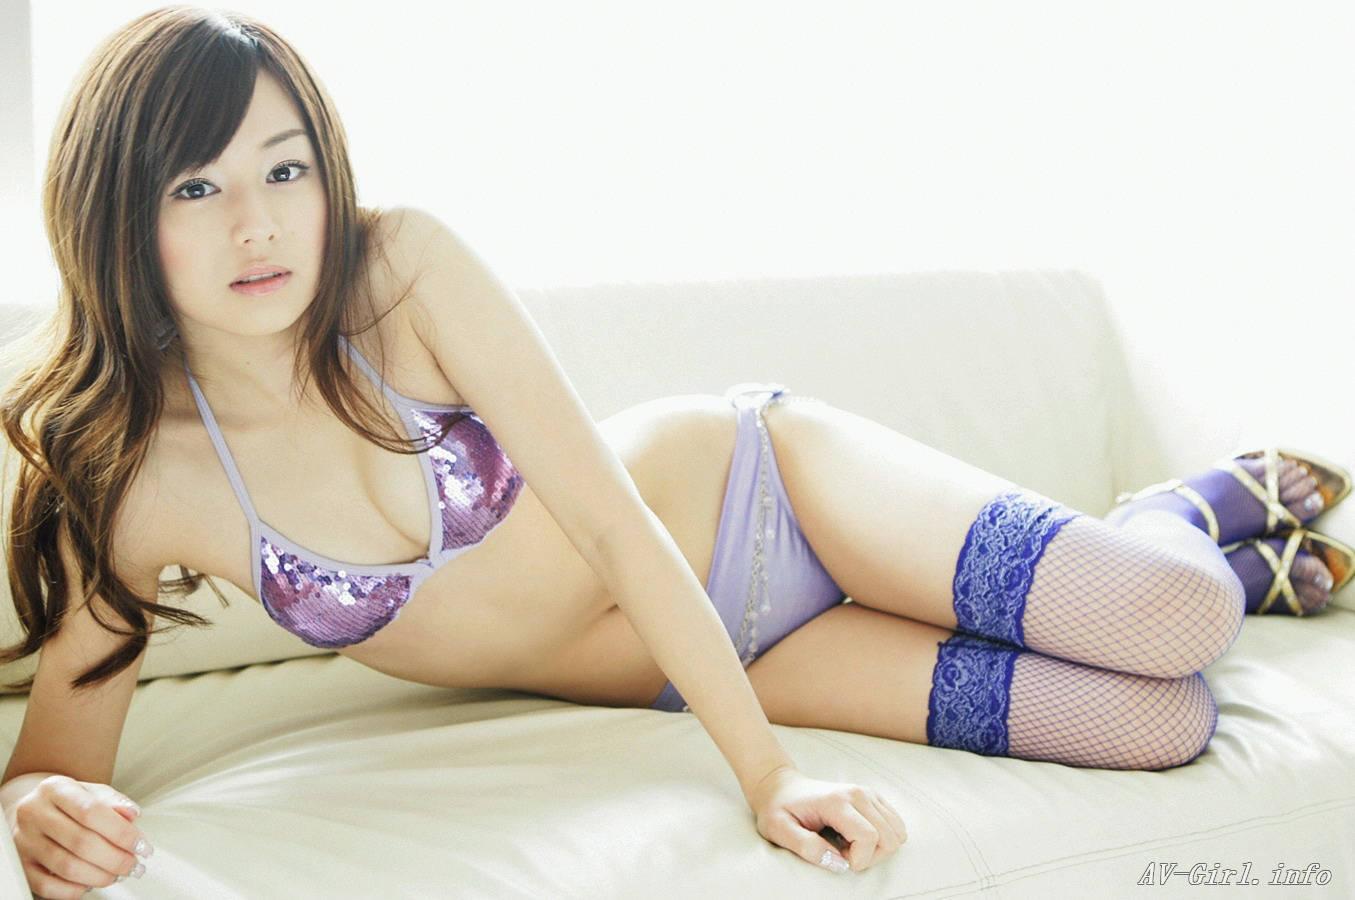 Best Porn Torrent Search Engine